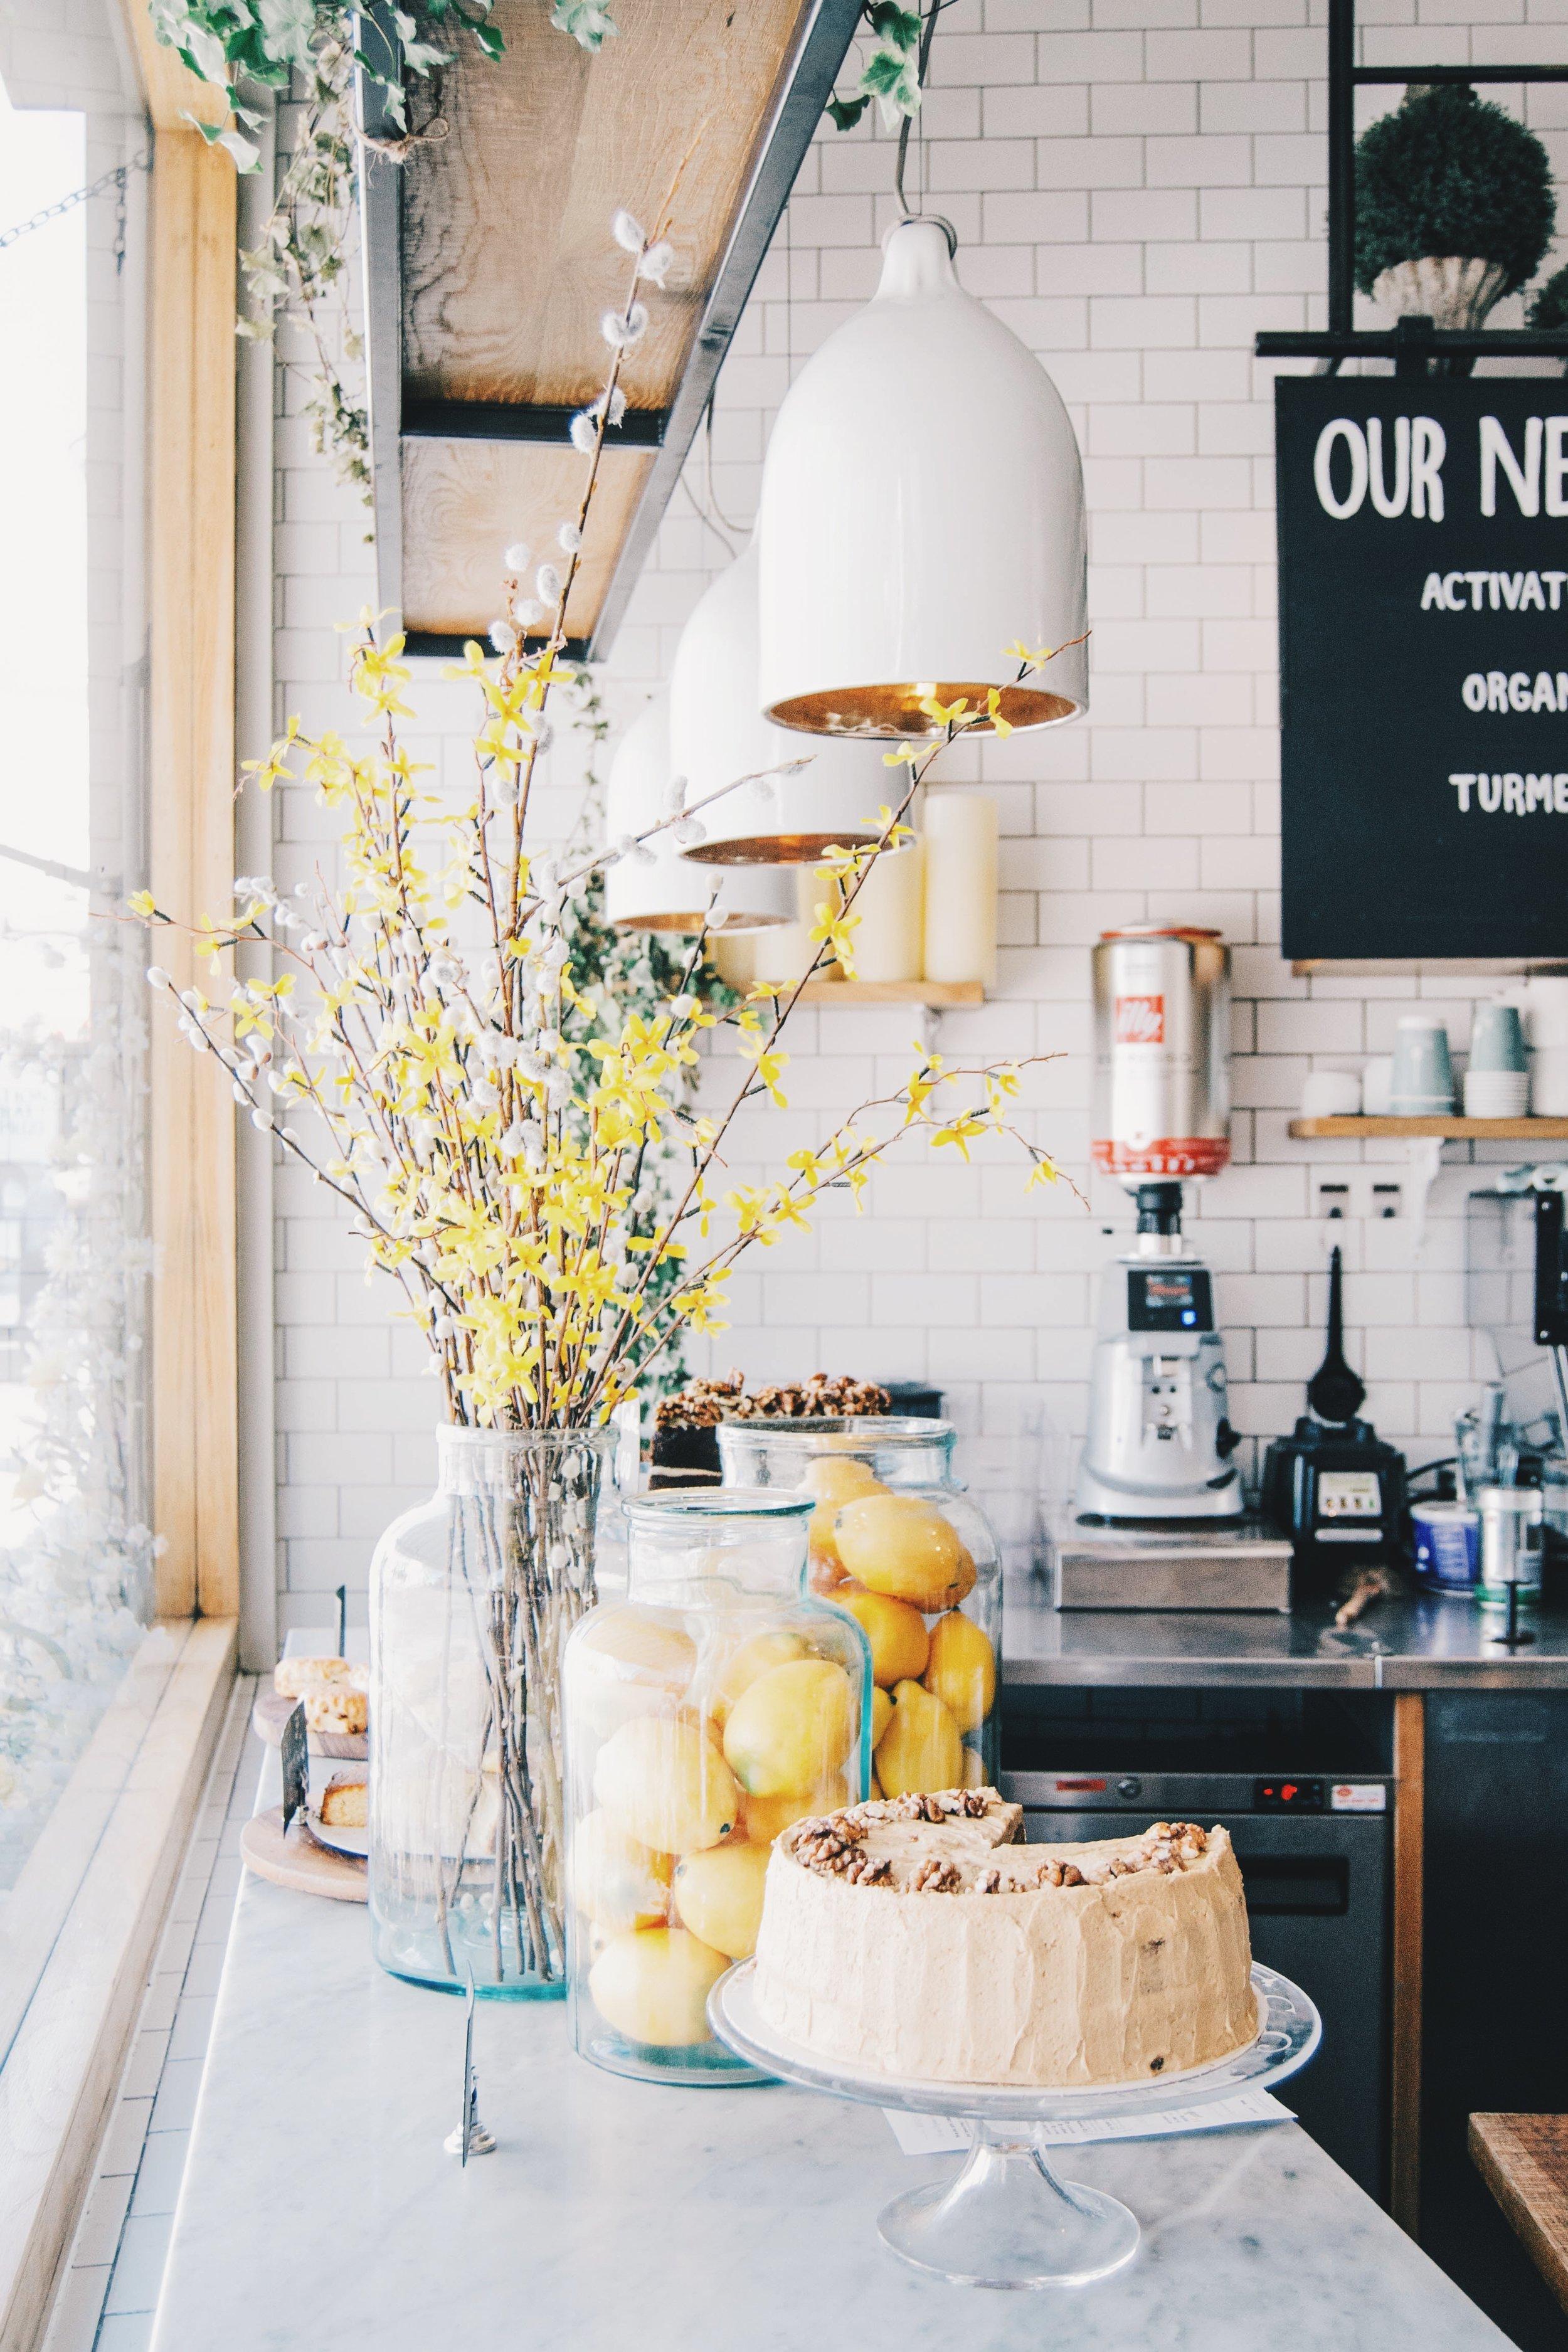 Kitchen Decor The Malibu Life Team Real Estate Compass